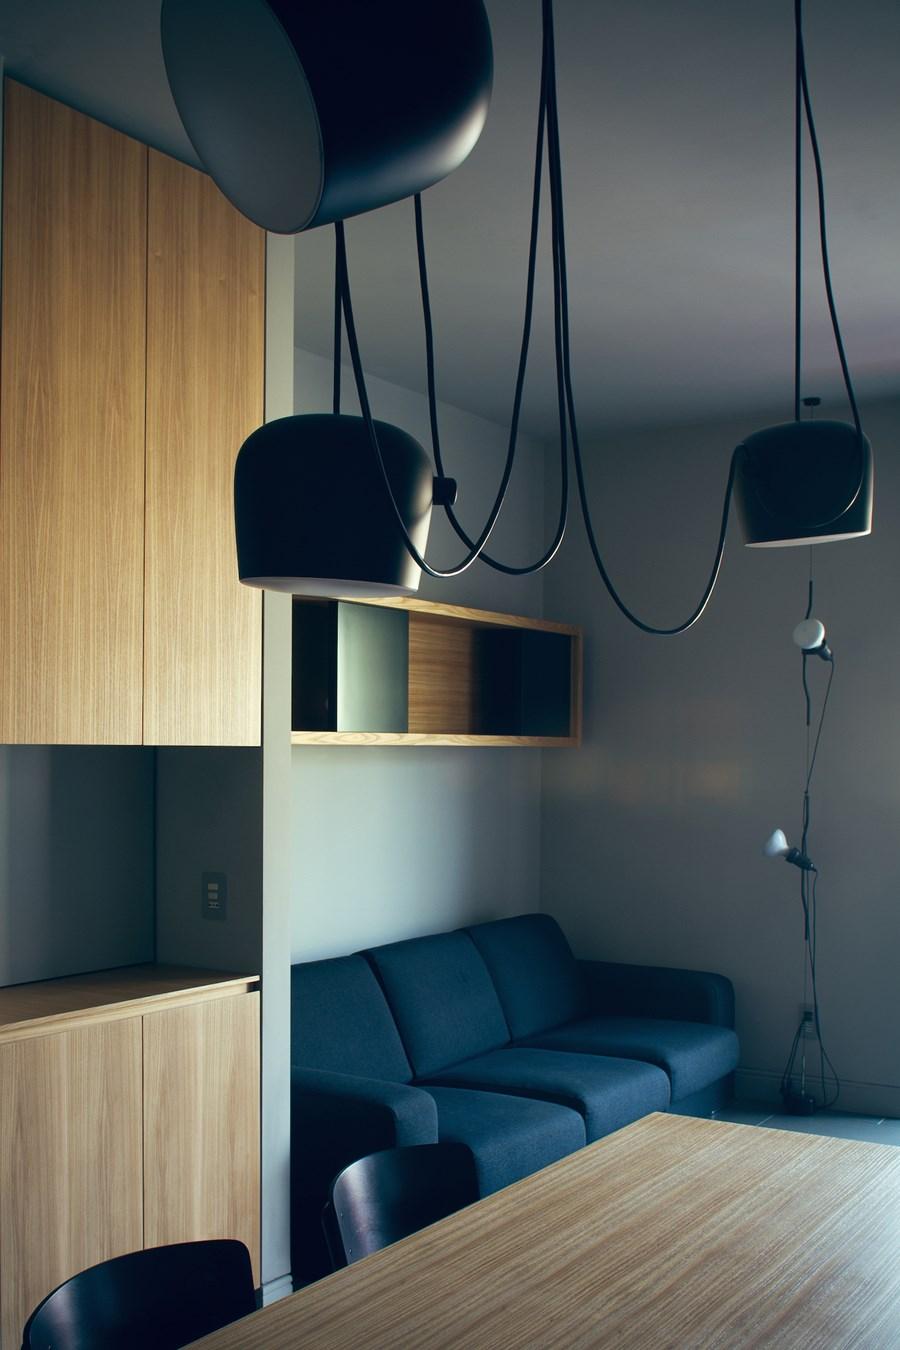 House#02 by Andrea Rubini architect 06